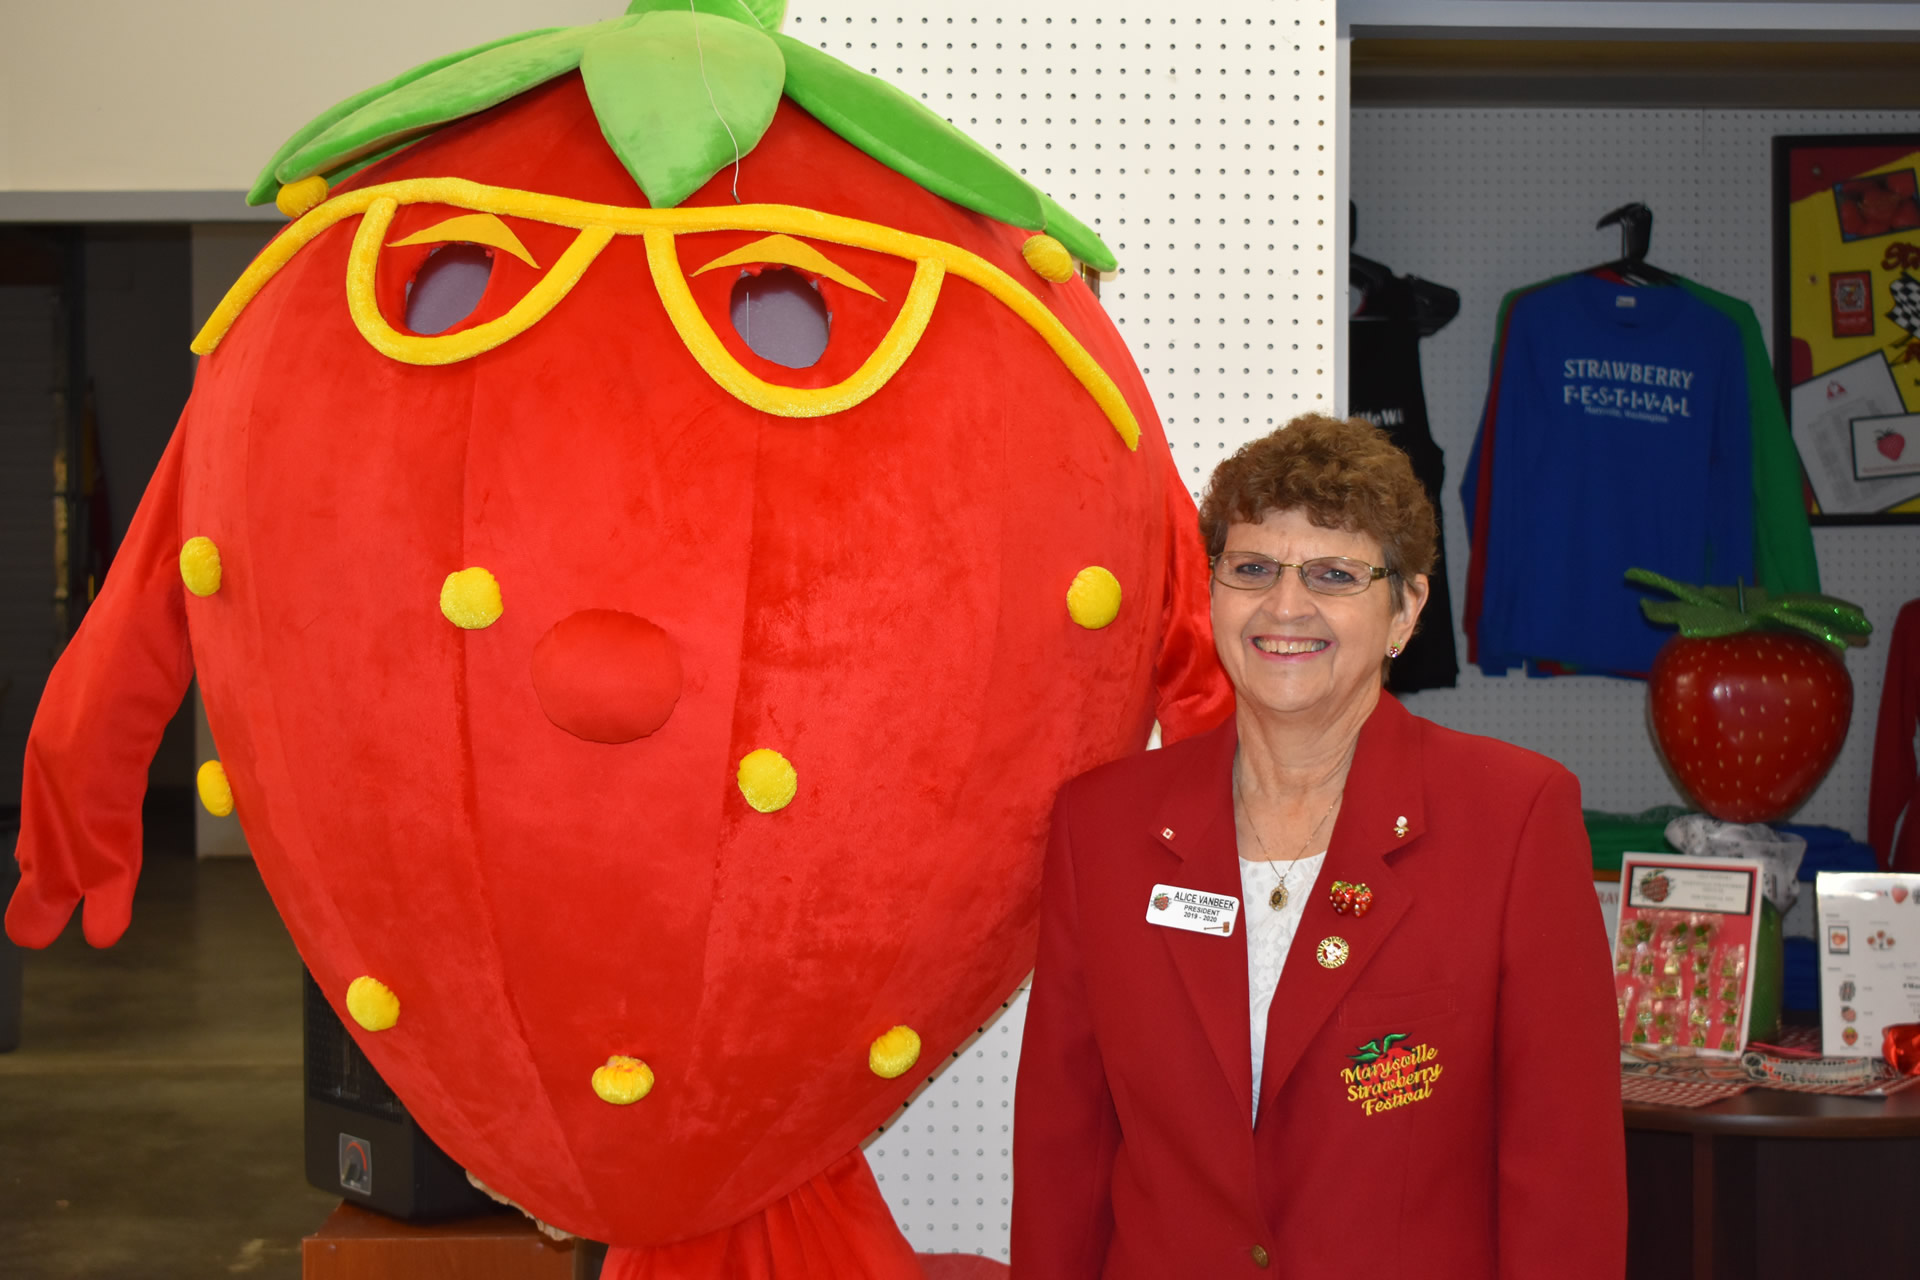 Marysville Strawberry Festival President 2020